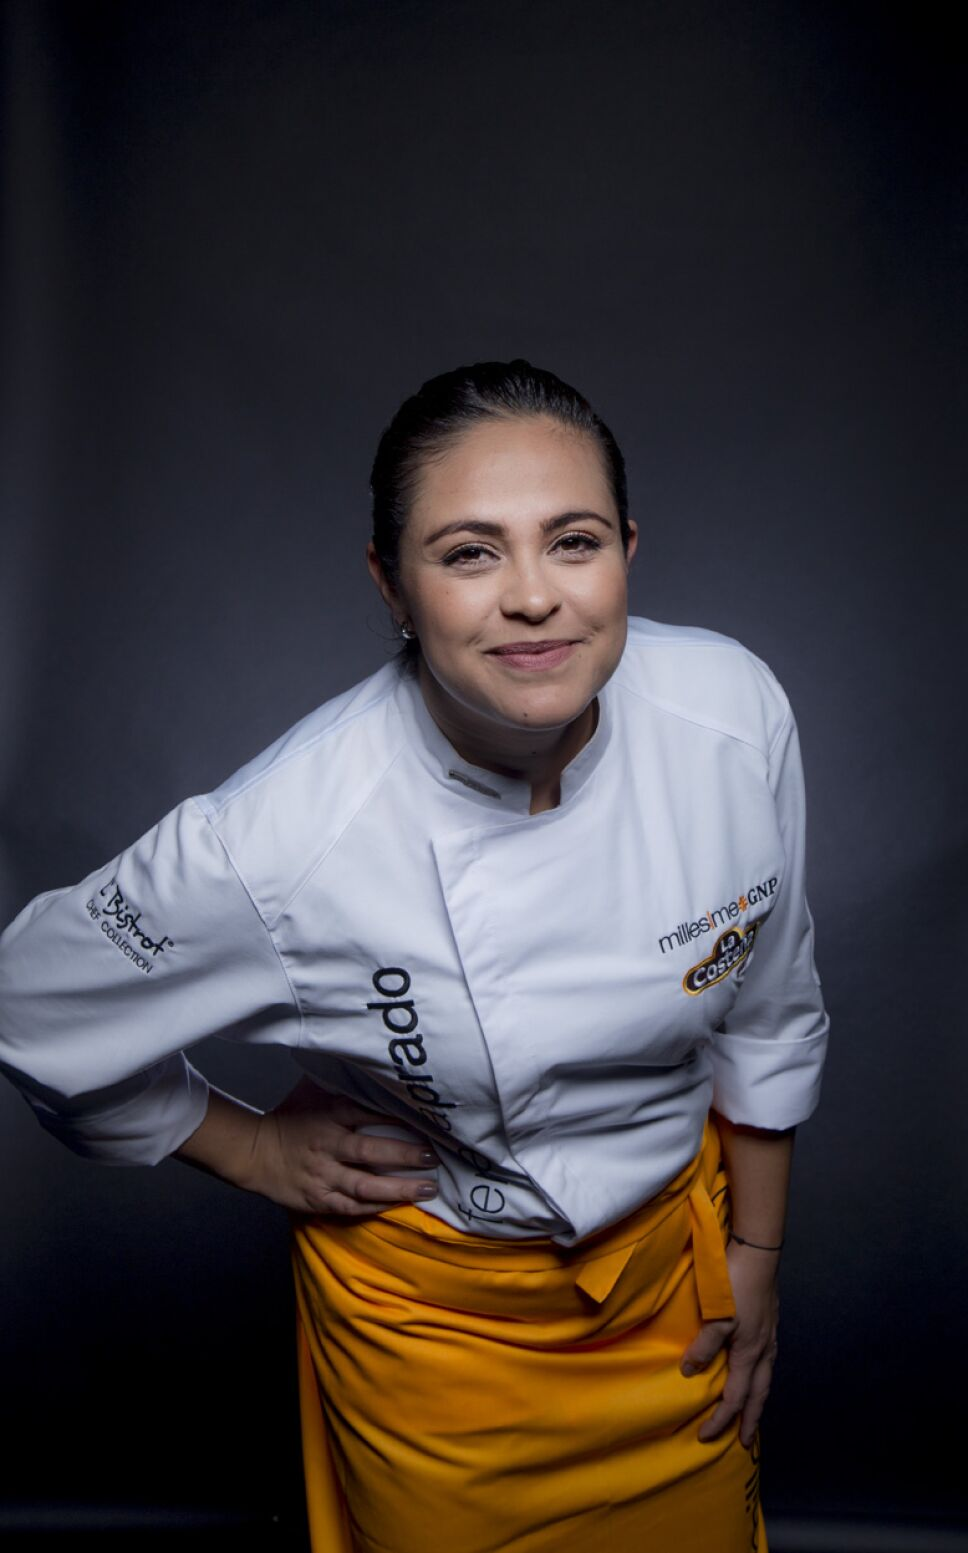 Fernanda Prado para La Costeña (3).jpg